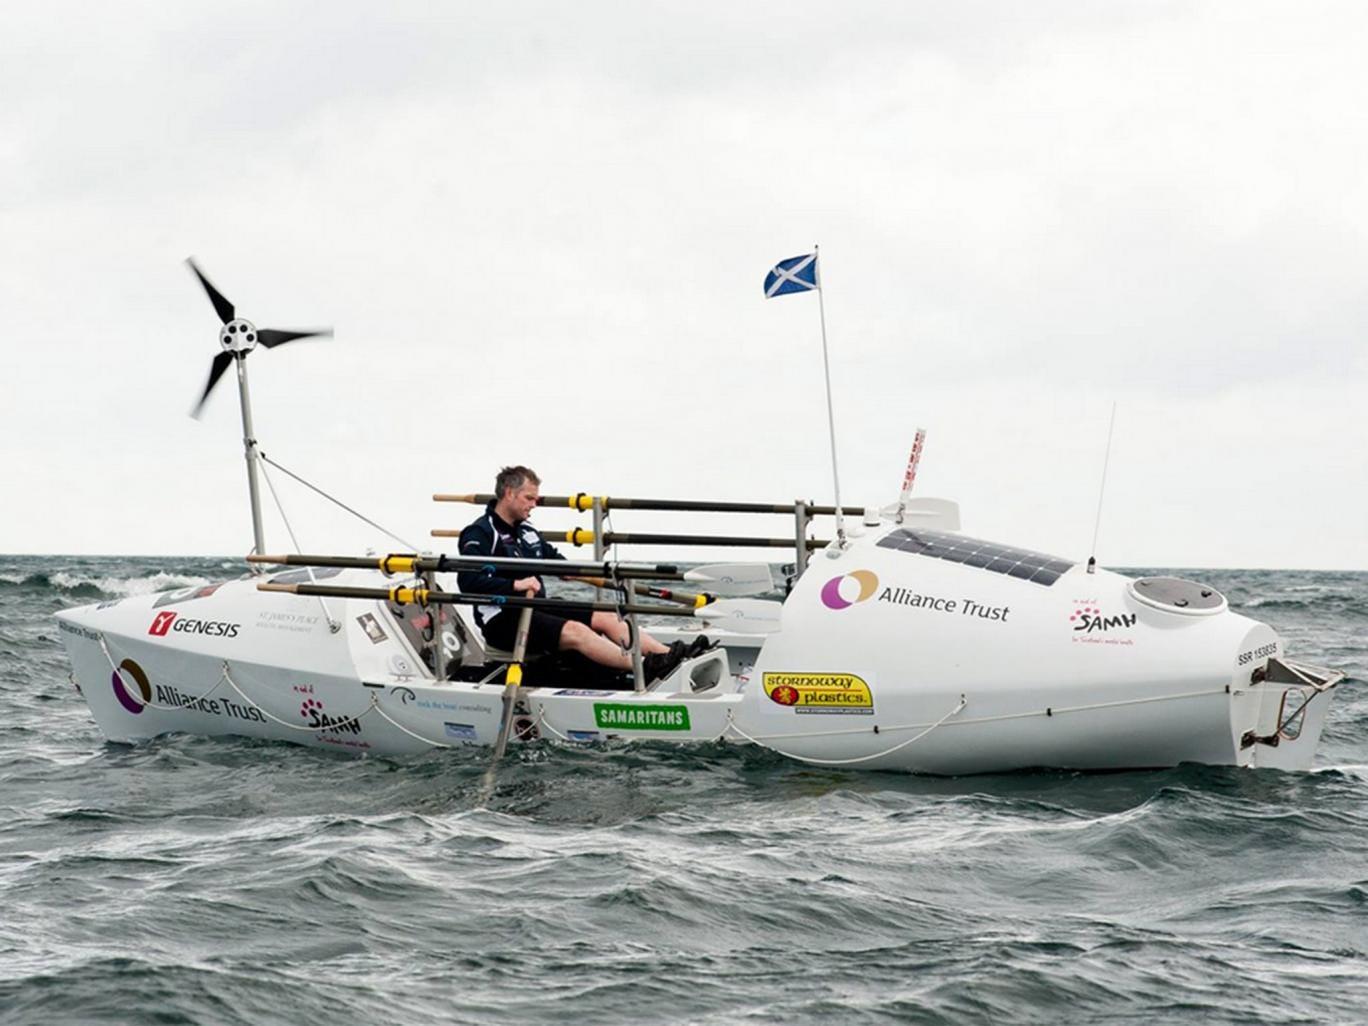 Niall Iain Macdonald in his 24-ft boat